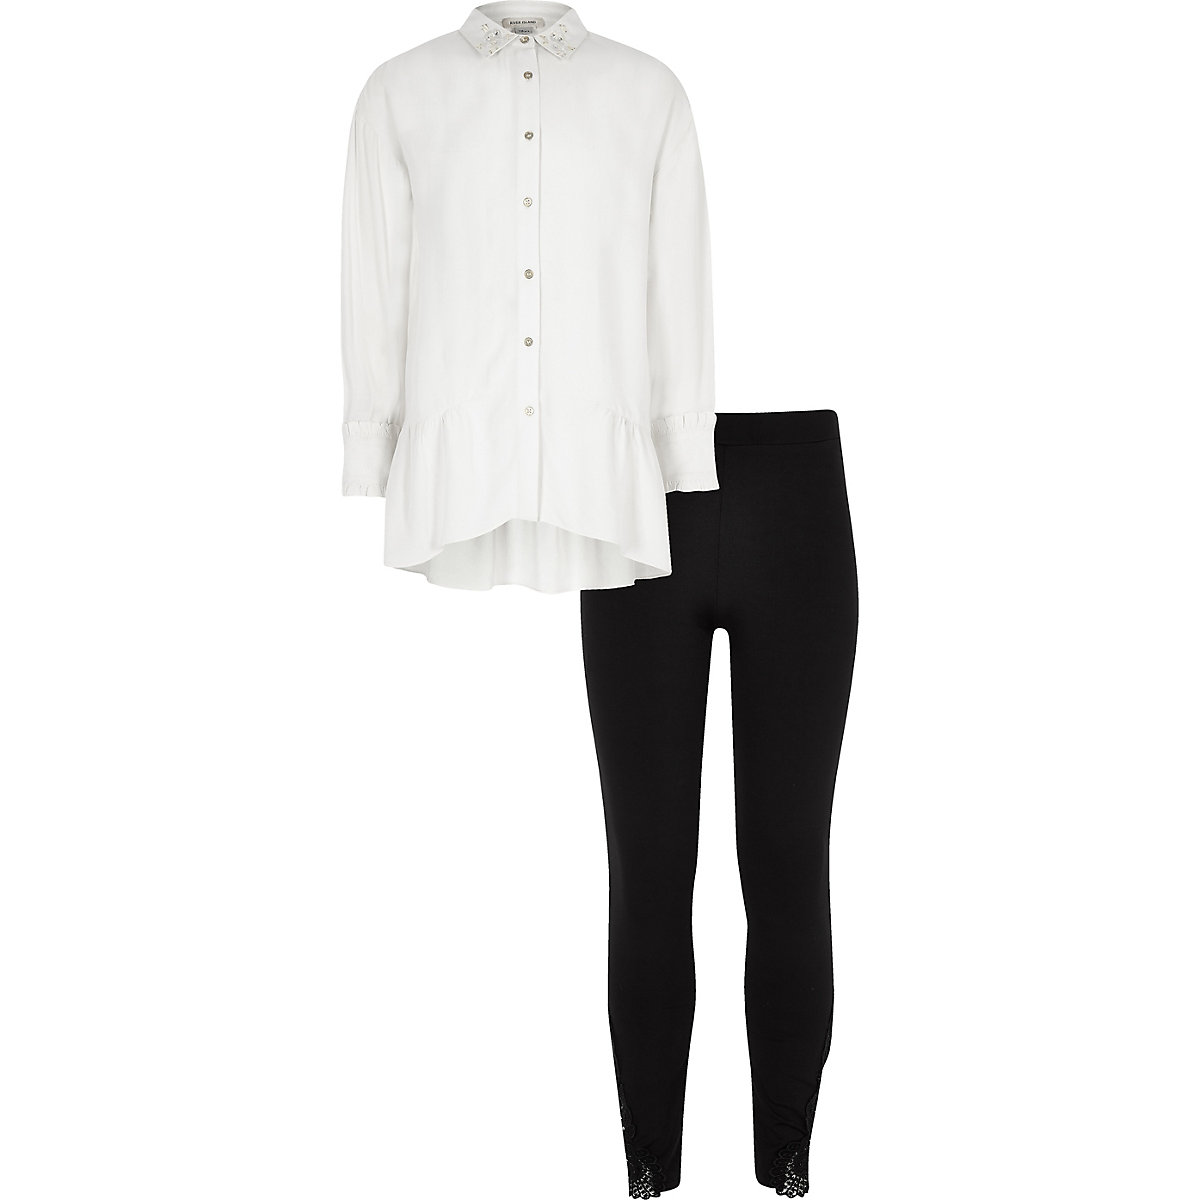 Girls cream longline shirt and leggings set